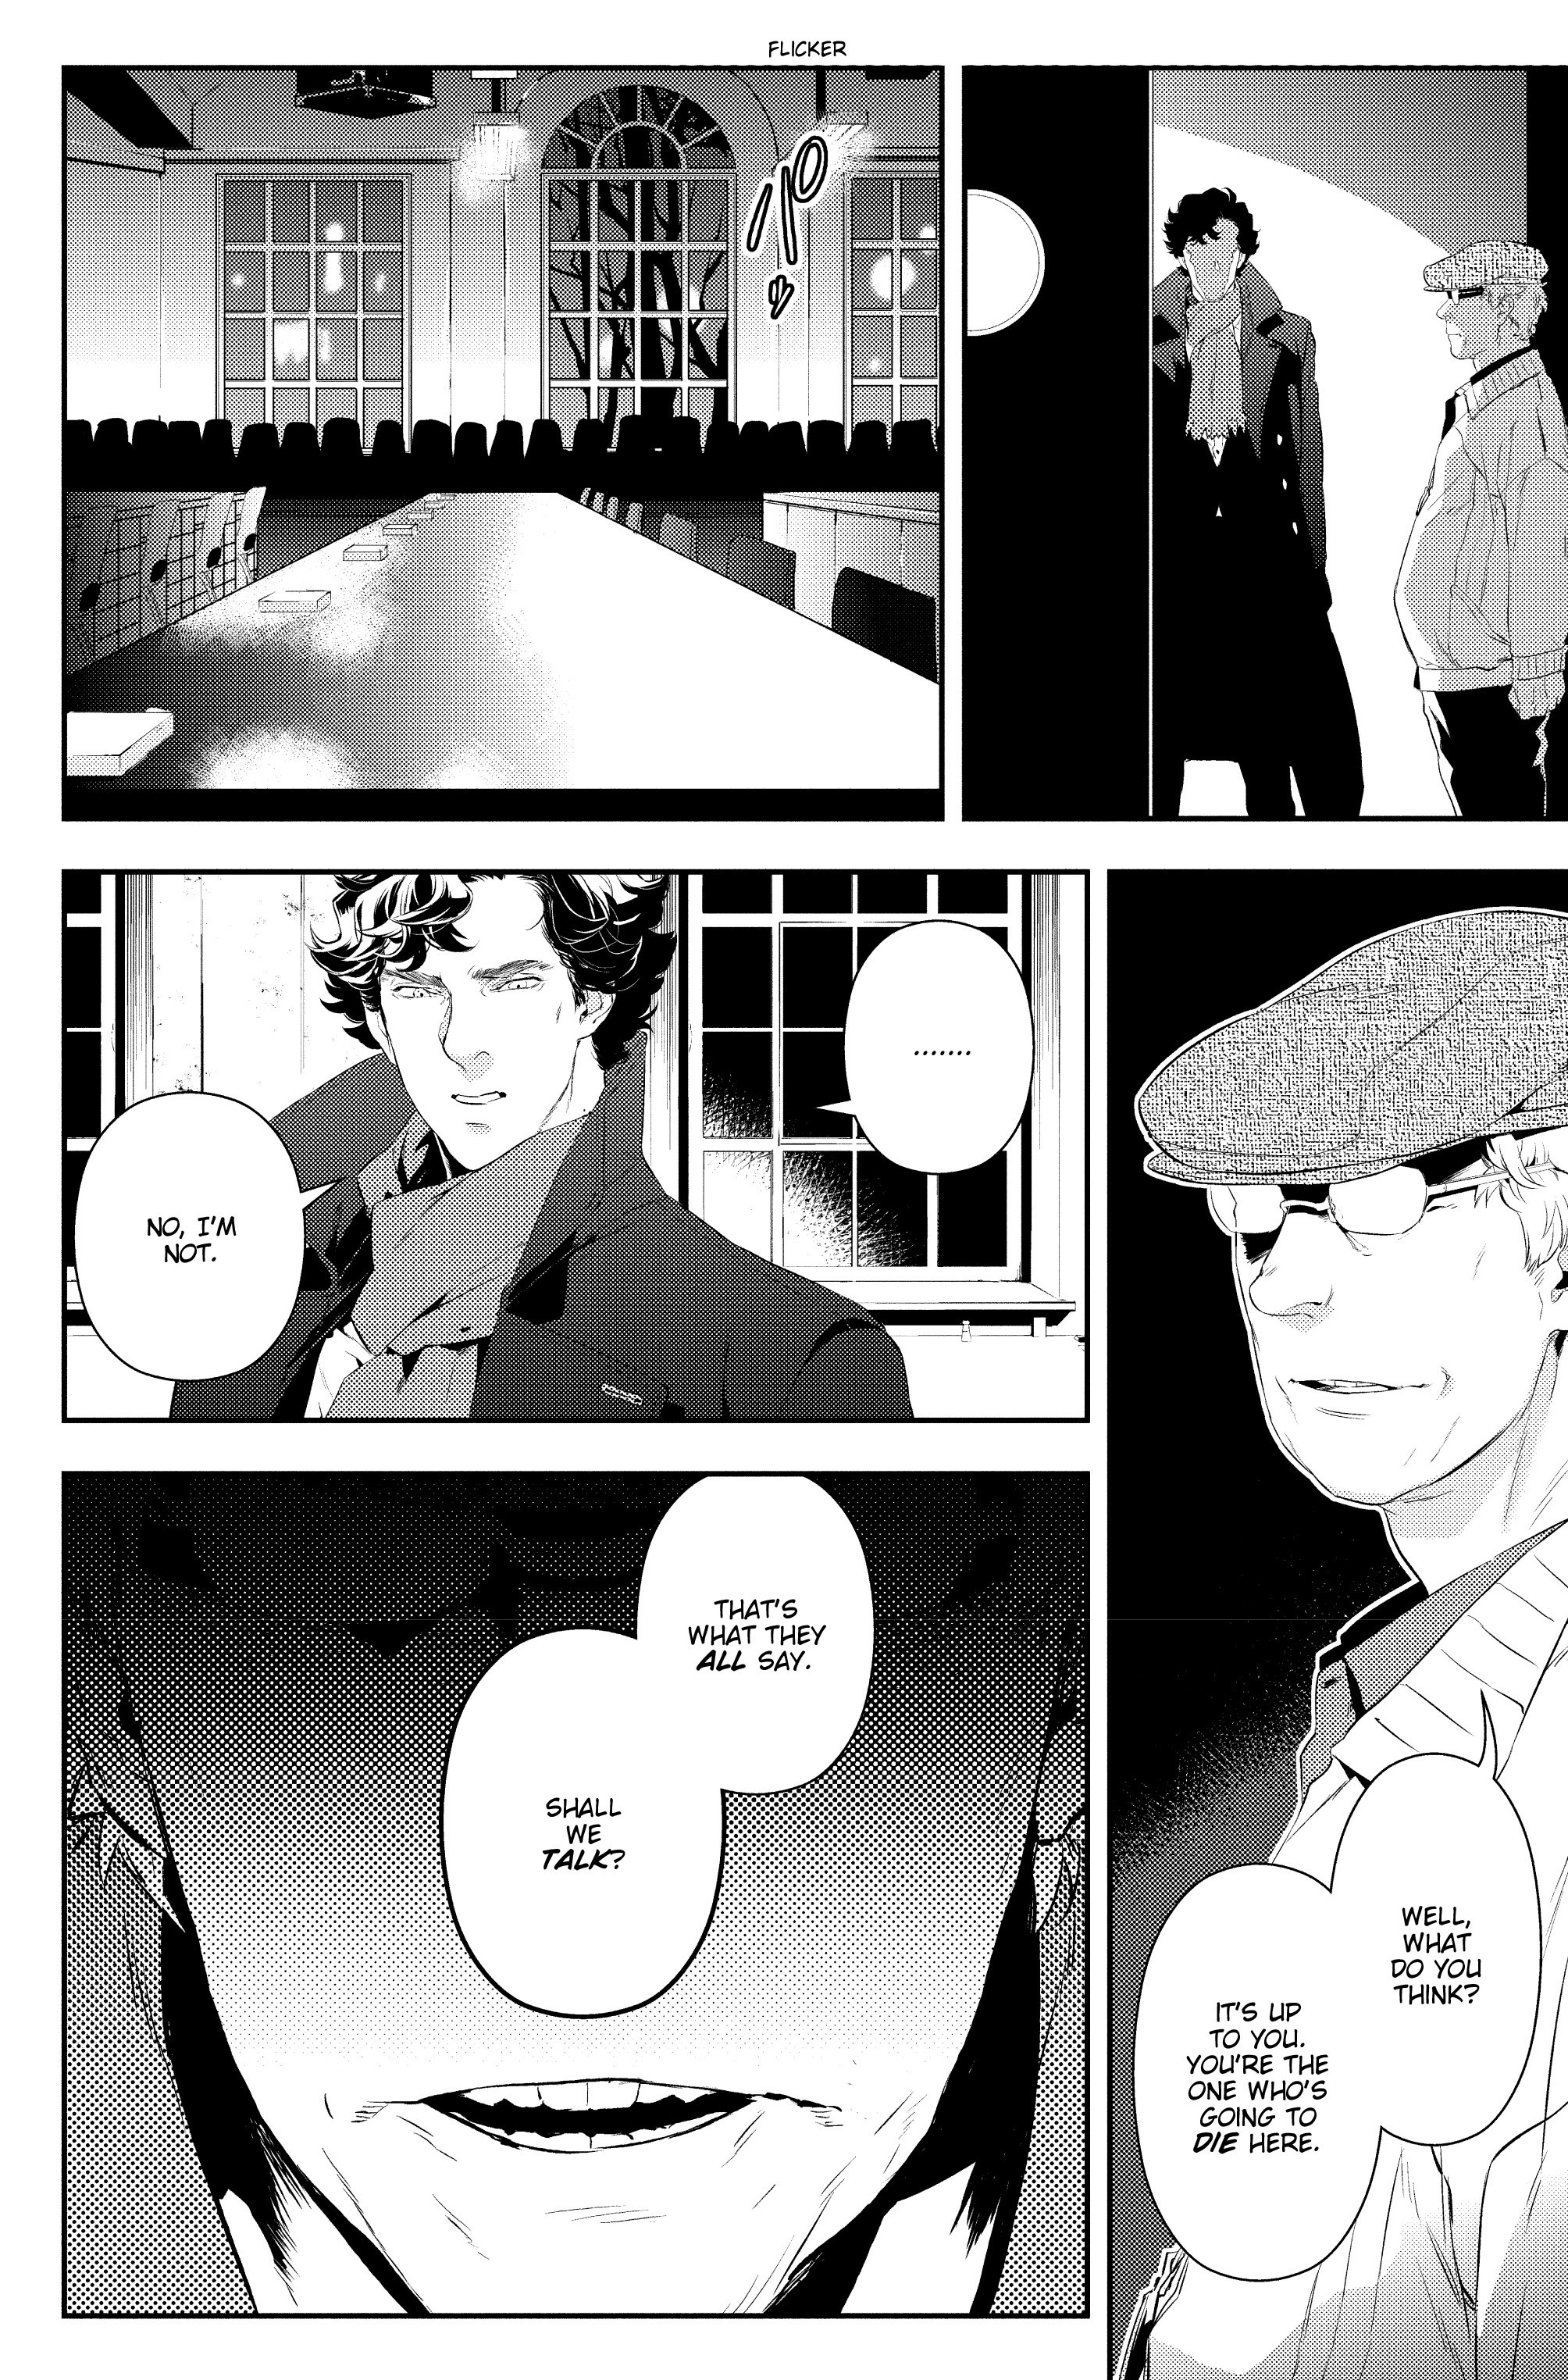 Read online Sherlock: A Study In Pink comic -  Issue #5 - 32